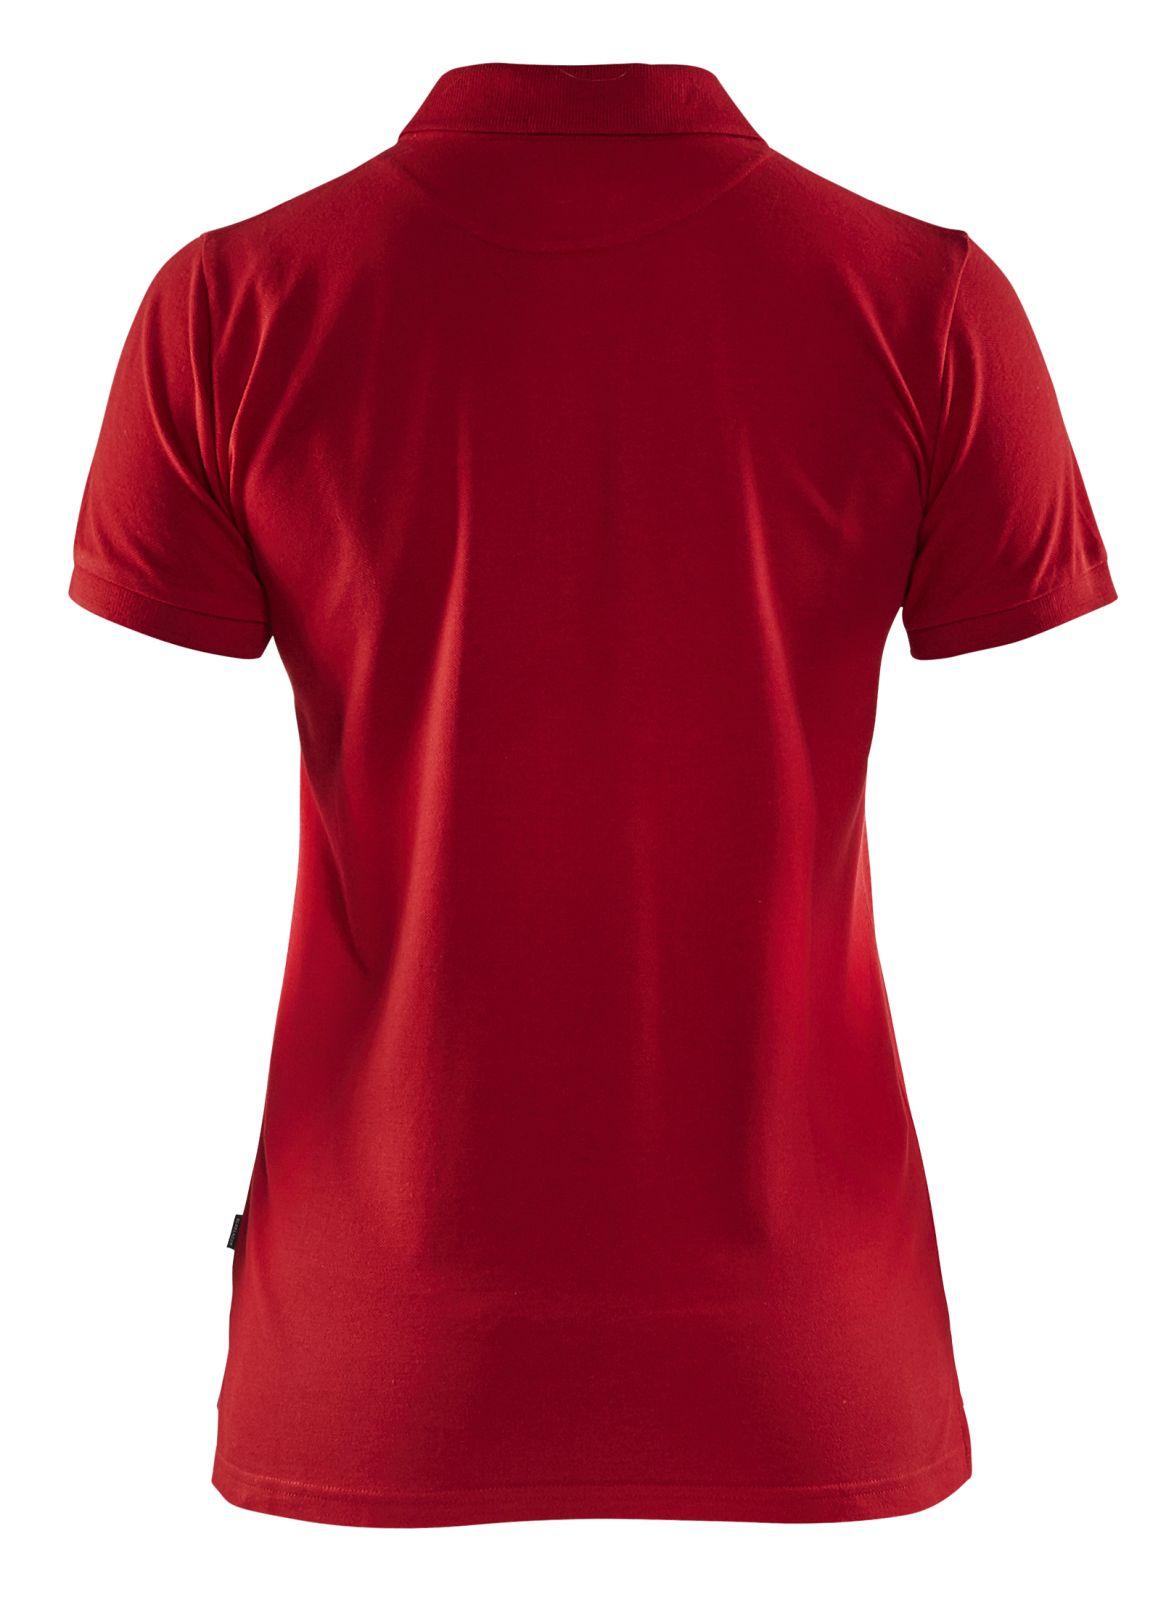 Blaklader Dames polo shirts 33071035 rood(5600)